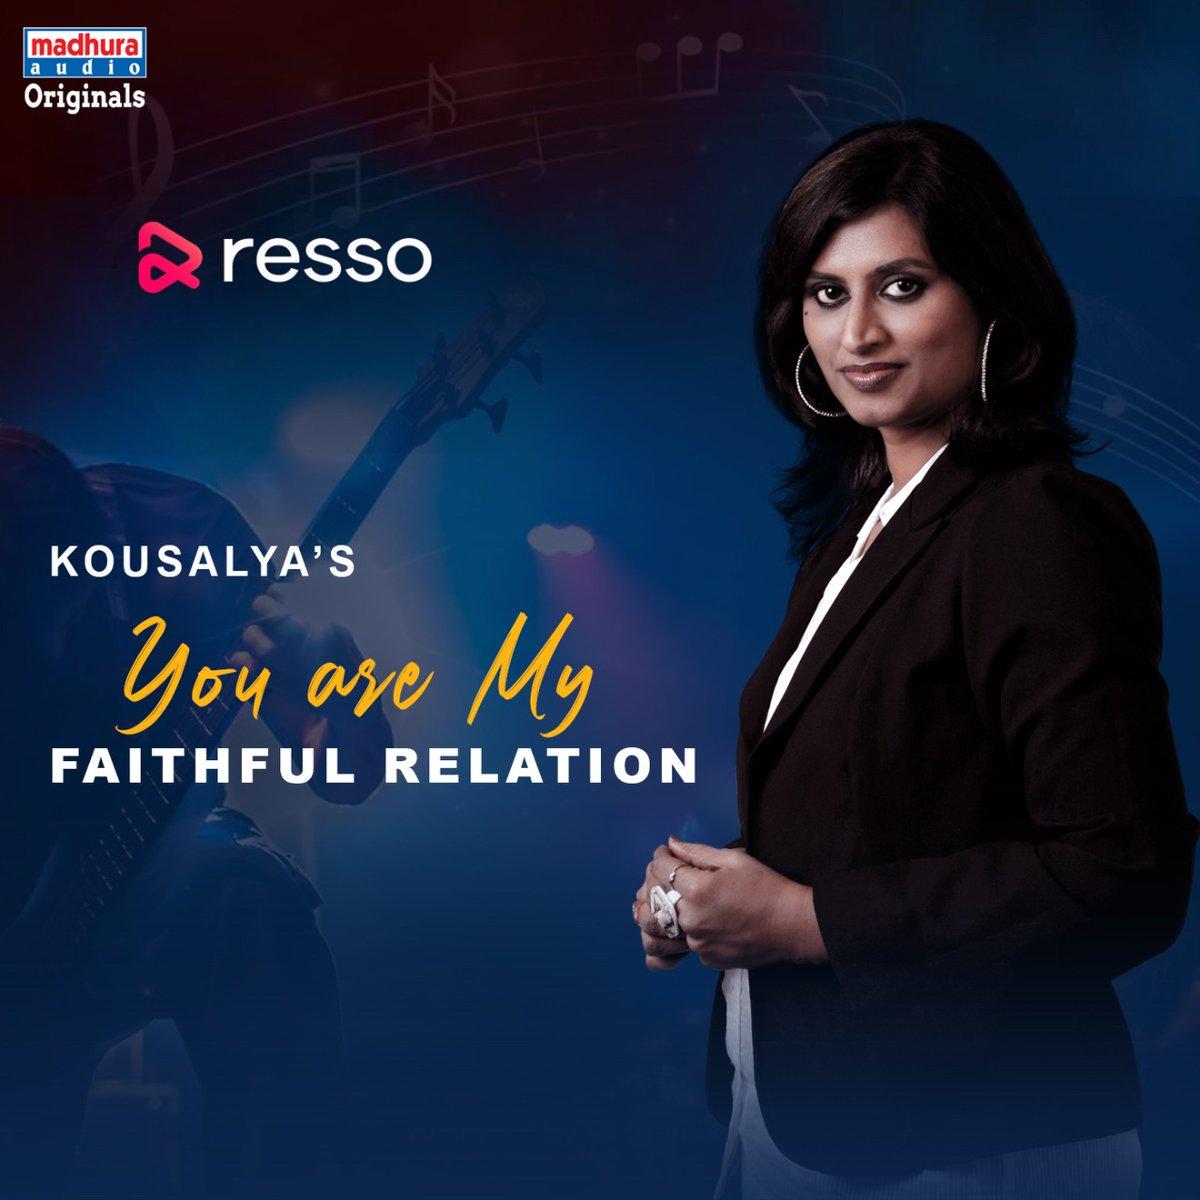 Talented Singer @Kousalyapotturi's #YouAreMyFaithfulRelation IS Streaming On Your Favorite OTT App  #Resso: https://m.resso.app/DASEkF/pic.twitter.com/uNqqwczIsR